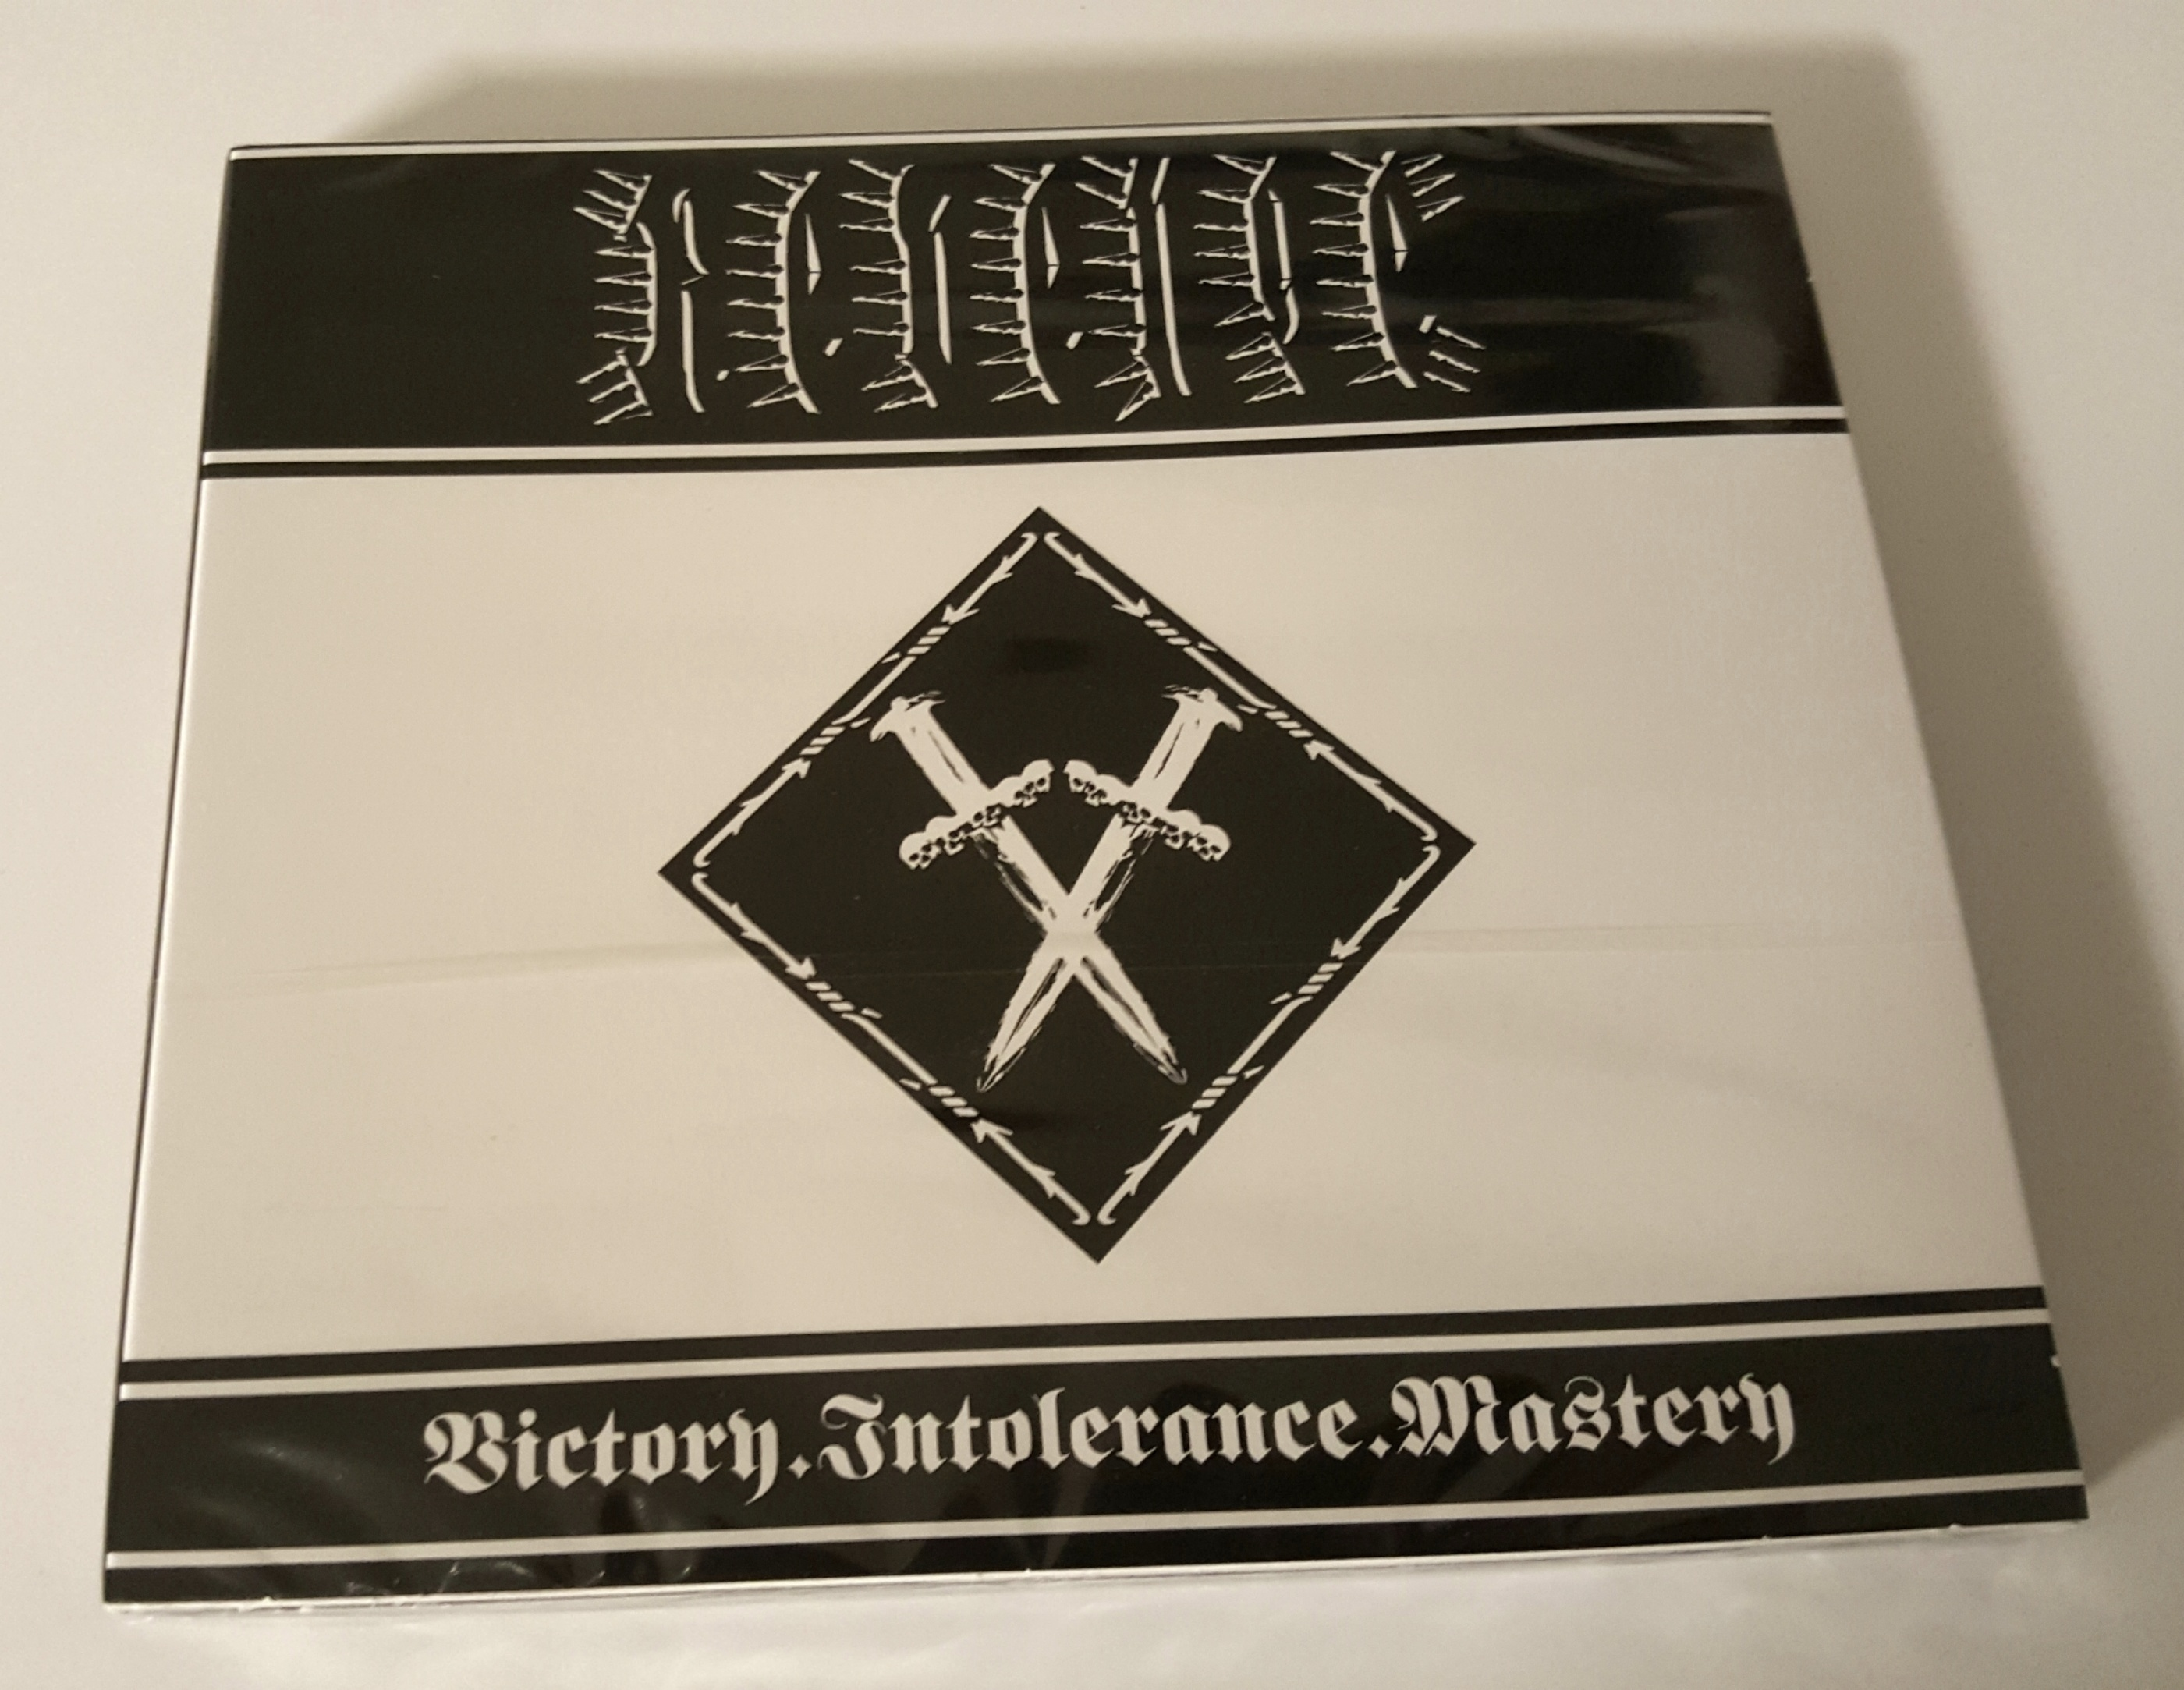 REVENGE - Victory. Intolerance. Mastery